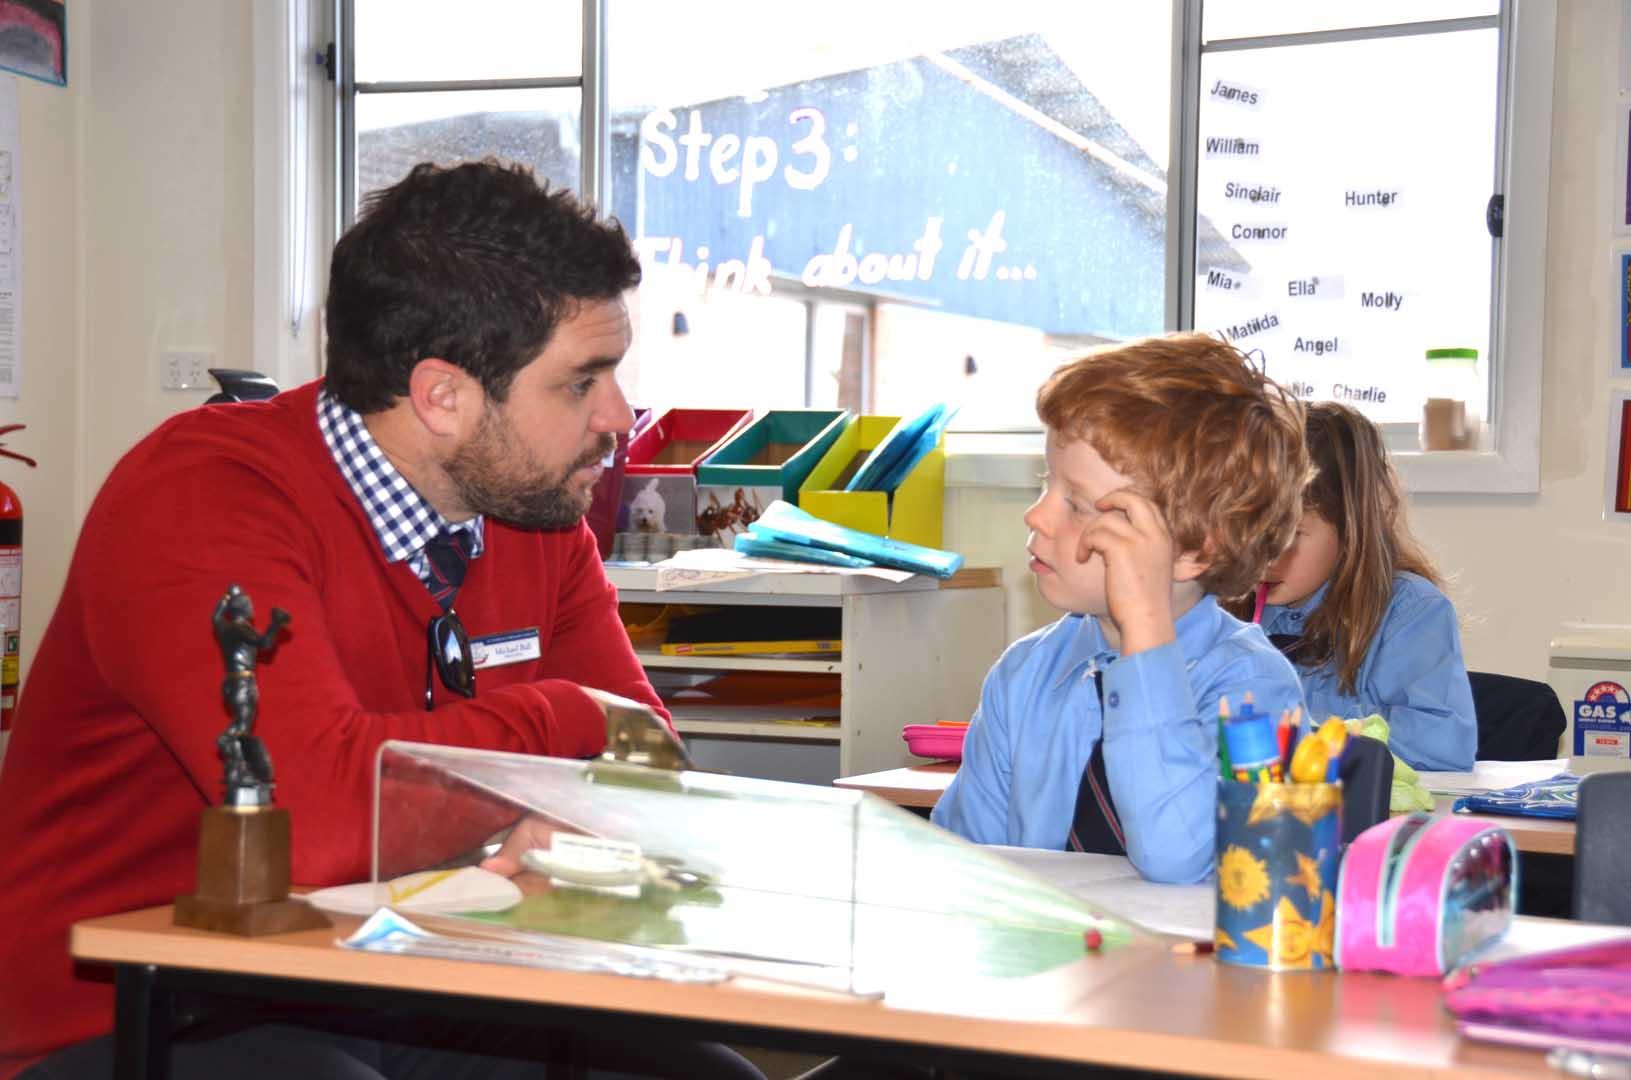 St-Patricks-walcha-classroom25